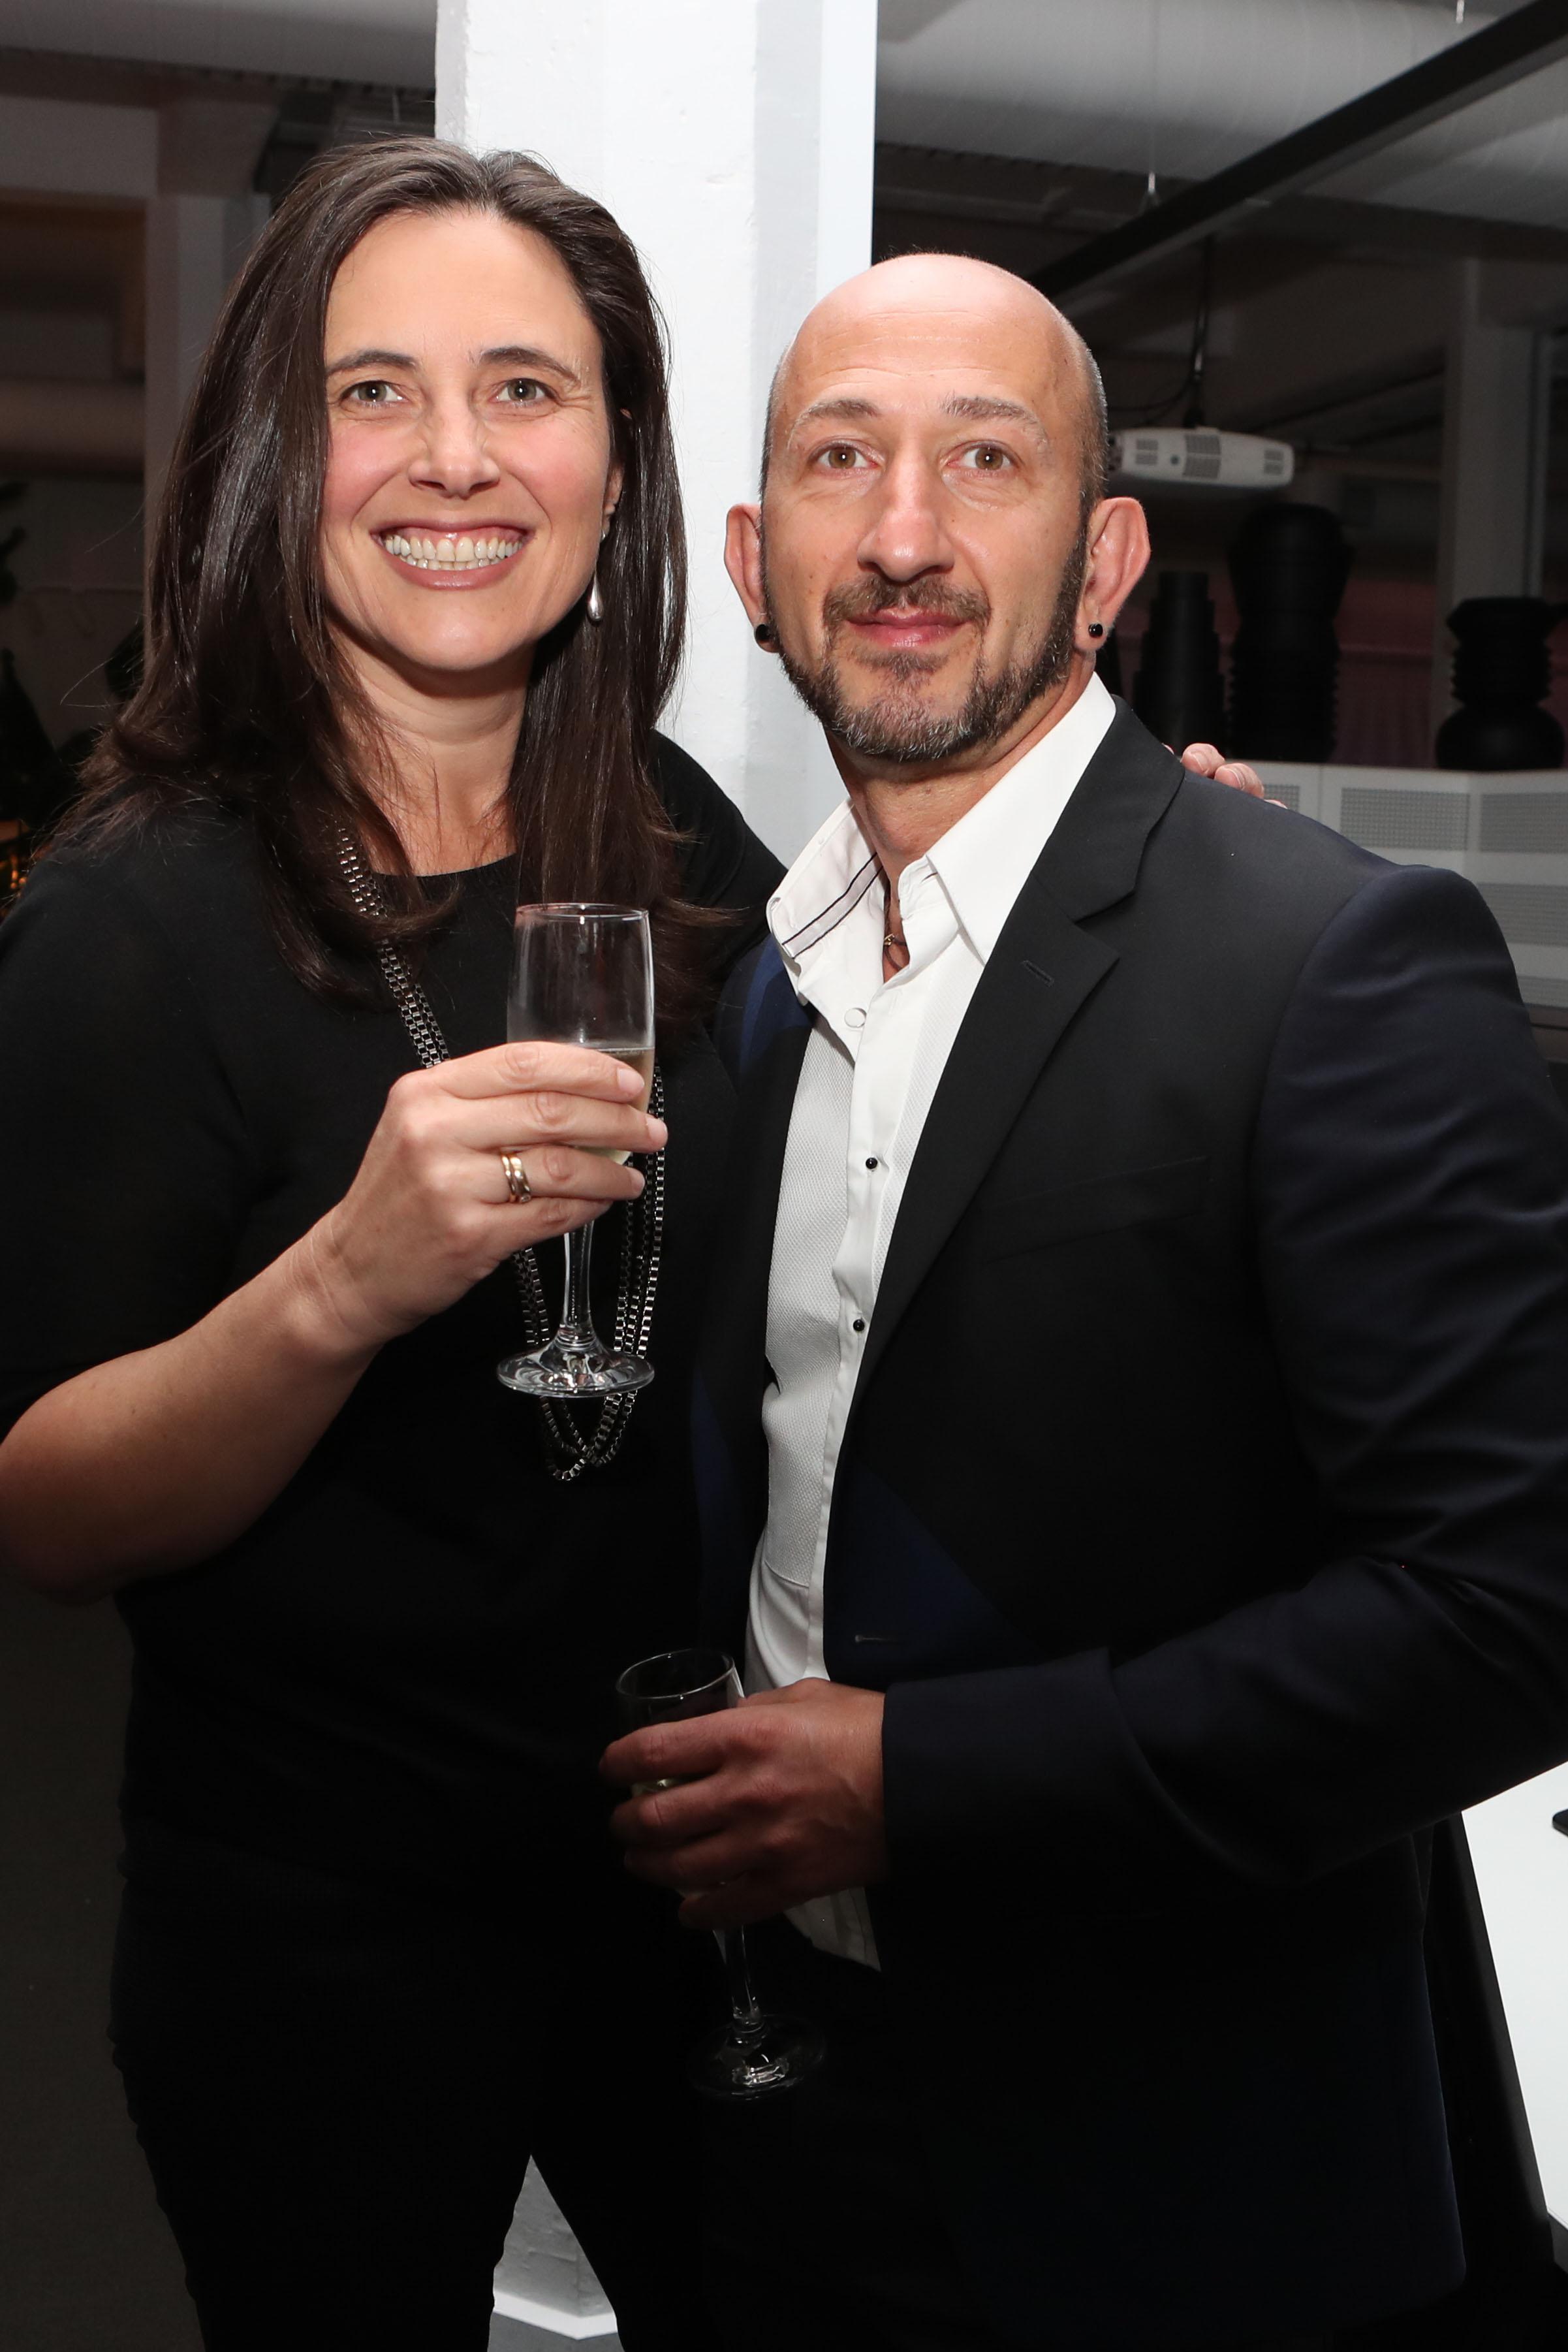 Kathy Karasavidis and Stacey Pavlou.jpg